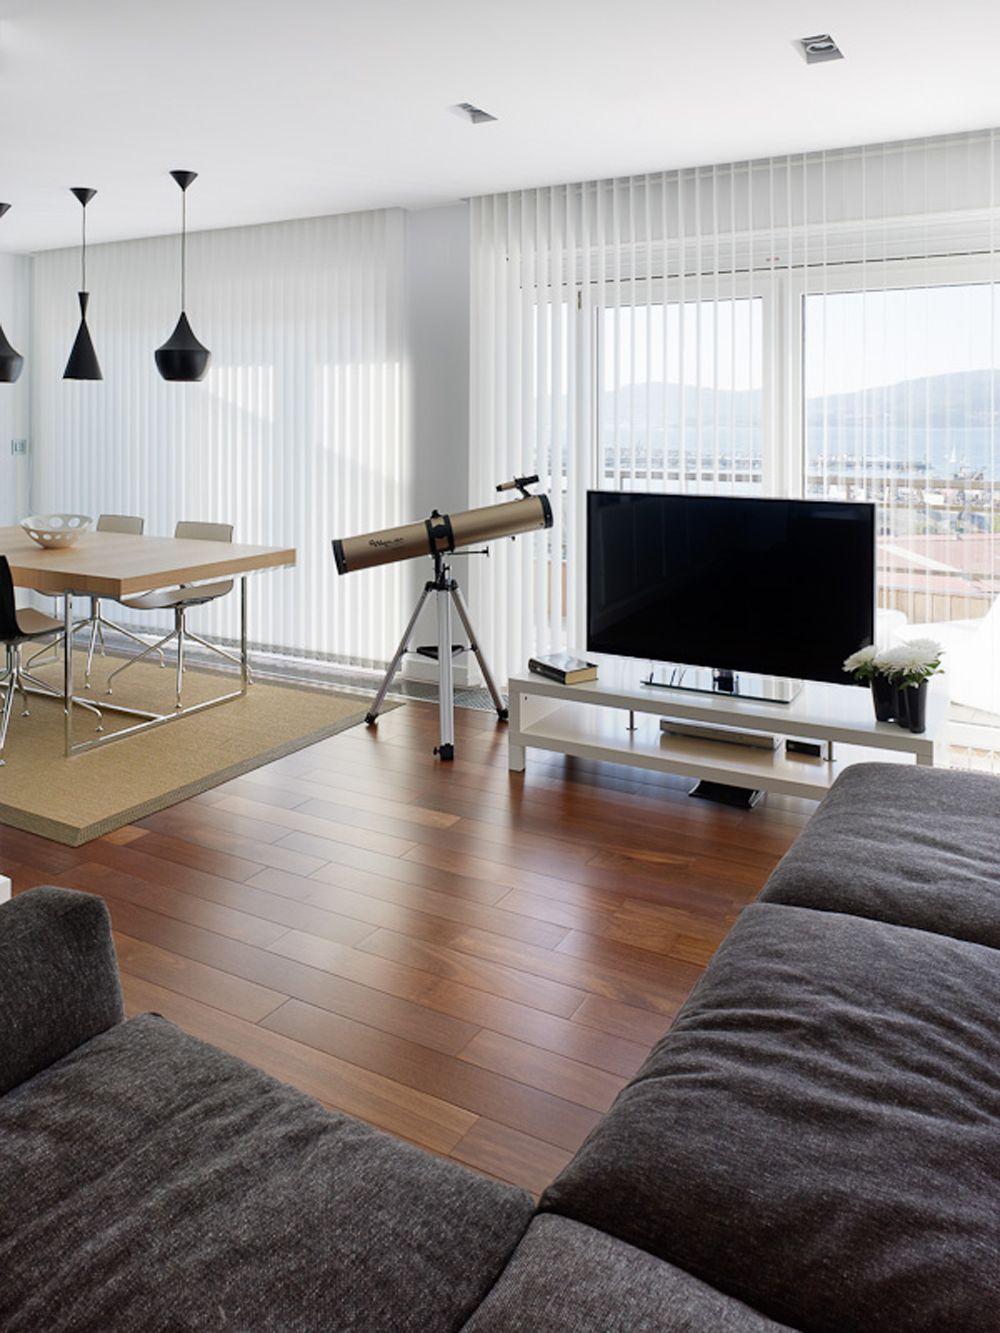 Decoracion Moderno Sala De Estar Sillas Mesas De Comedor  # Muebles Paz To Home